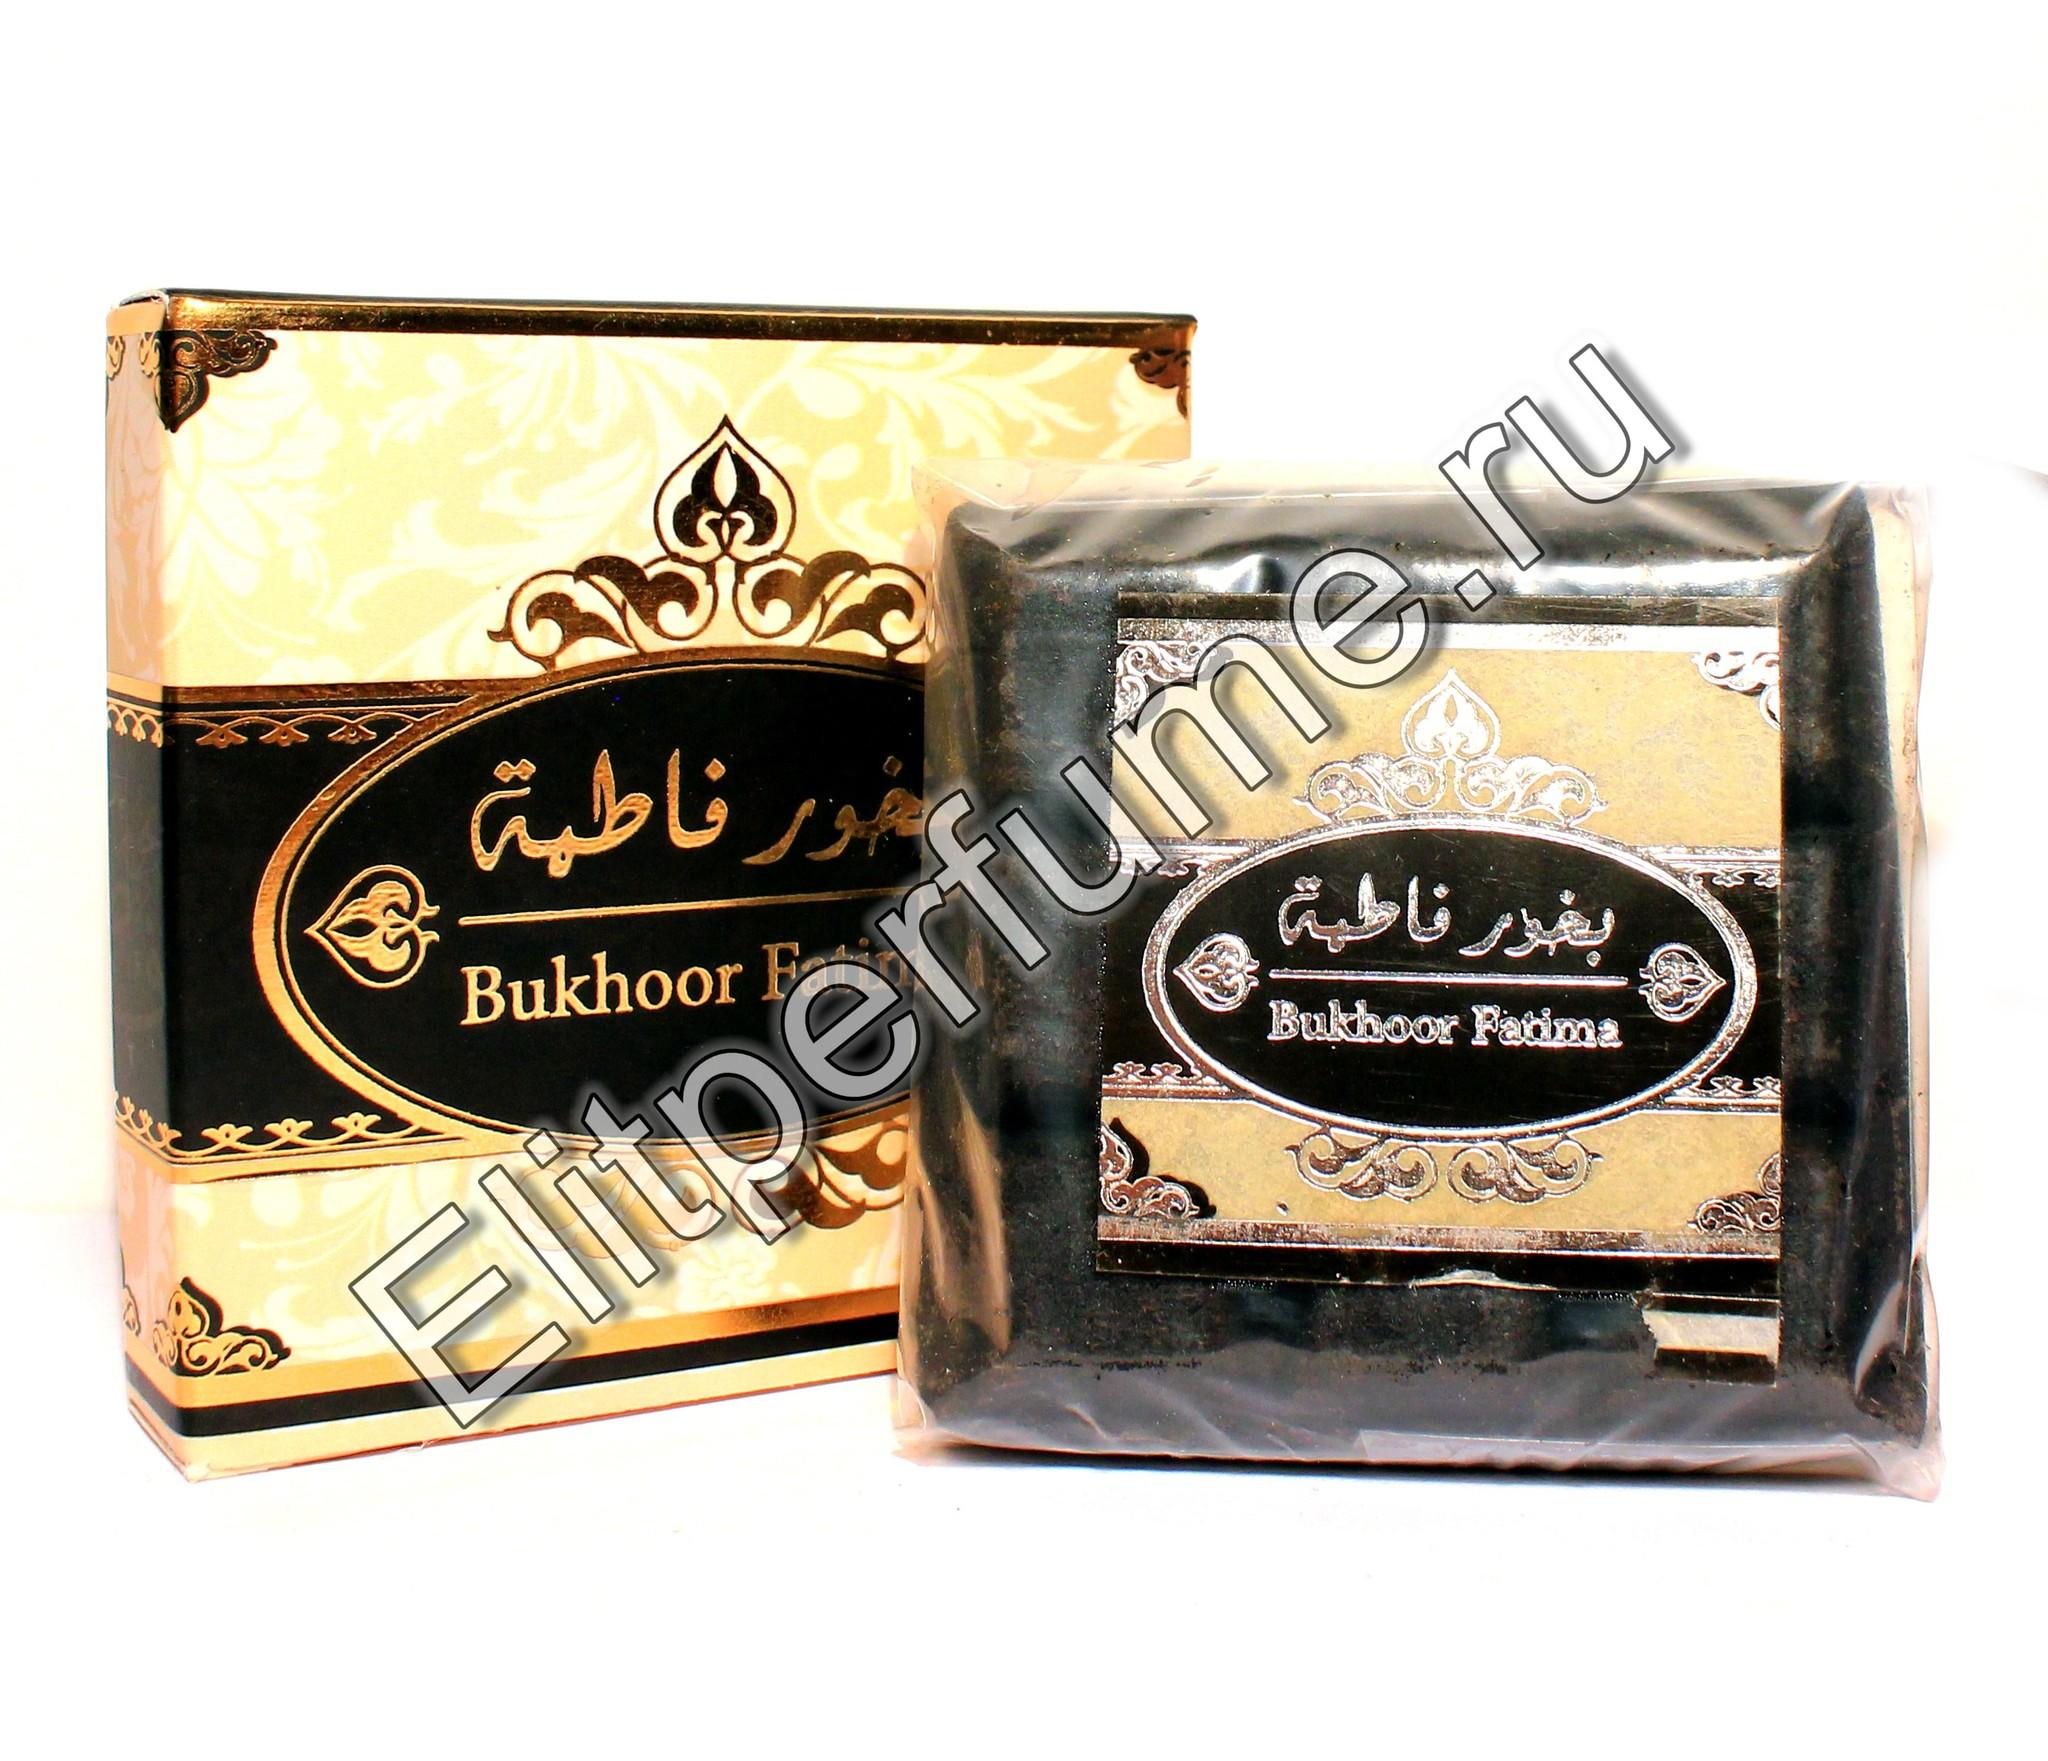 Bakhoor Fatima Бахур Фатима 40 гр. аромосмесь от Ард Аль Заафаран Ard Al Zaafaran